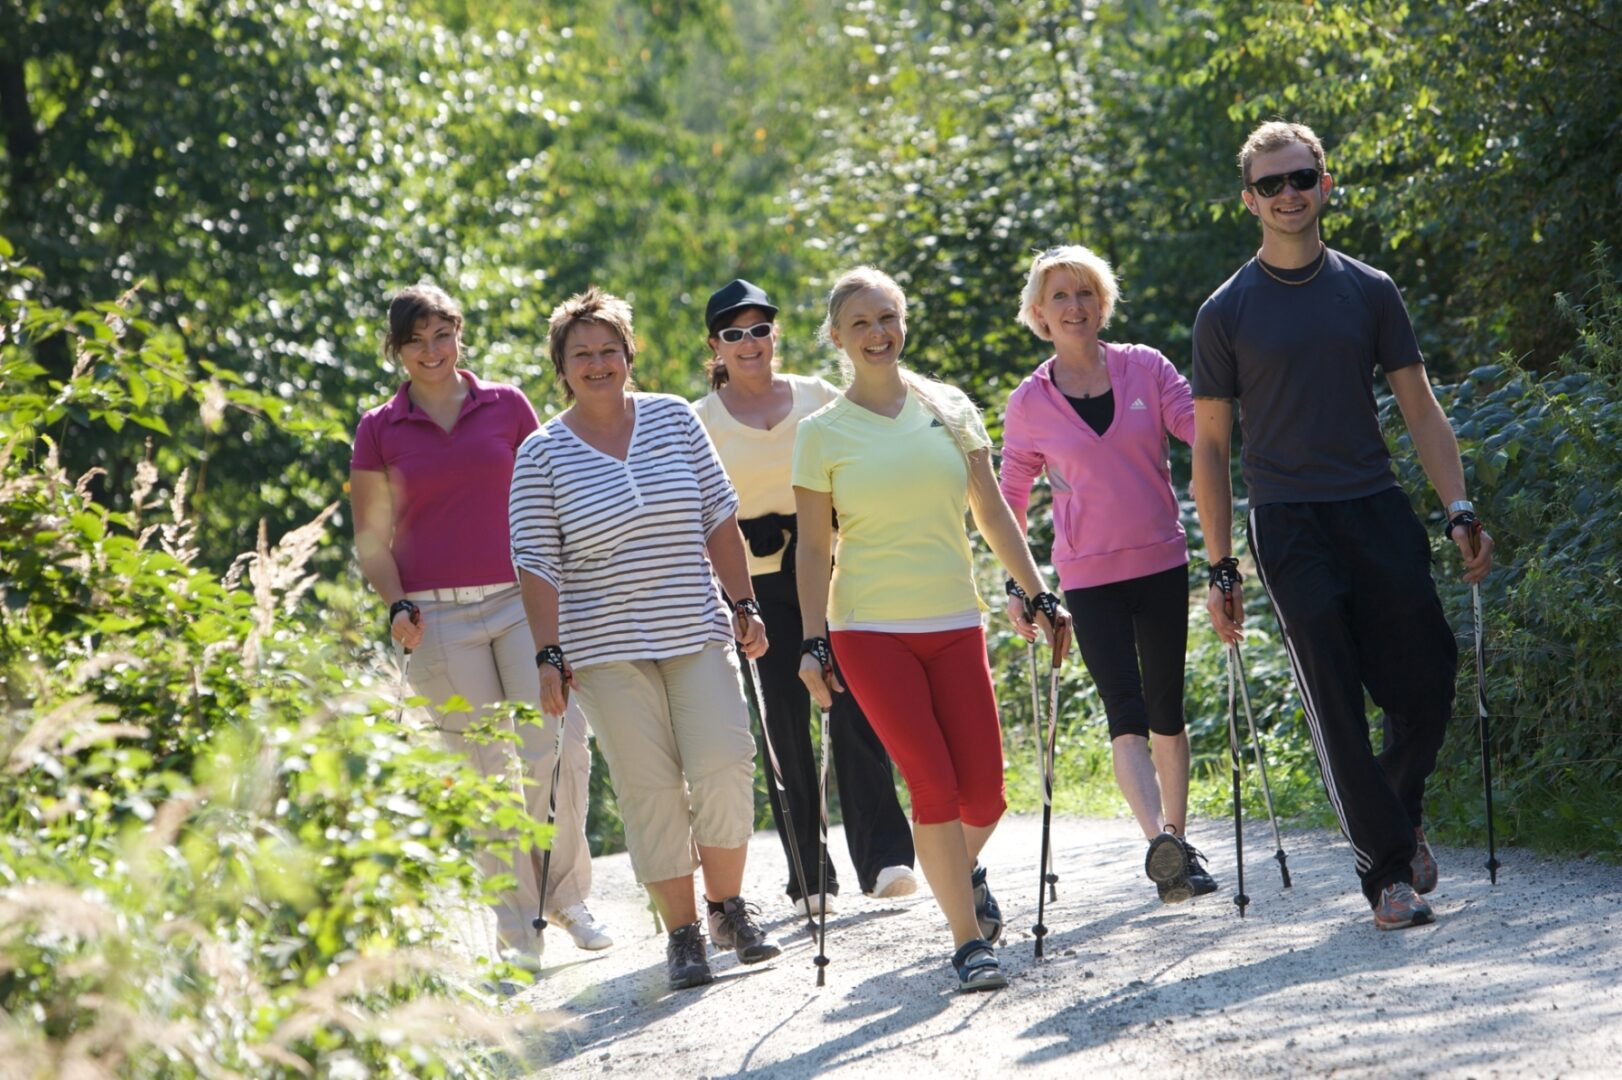 Nordic Walking AktiVital Hotel in Bad Griesbach